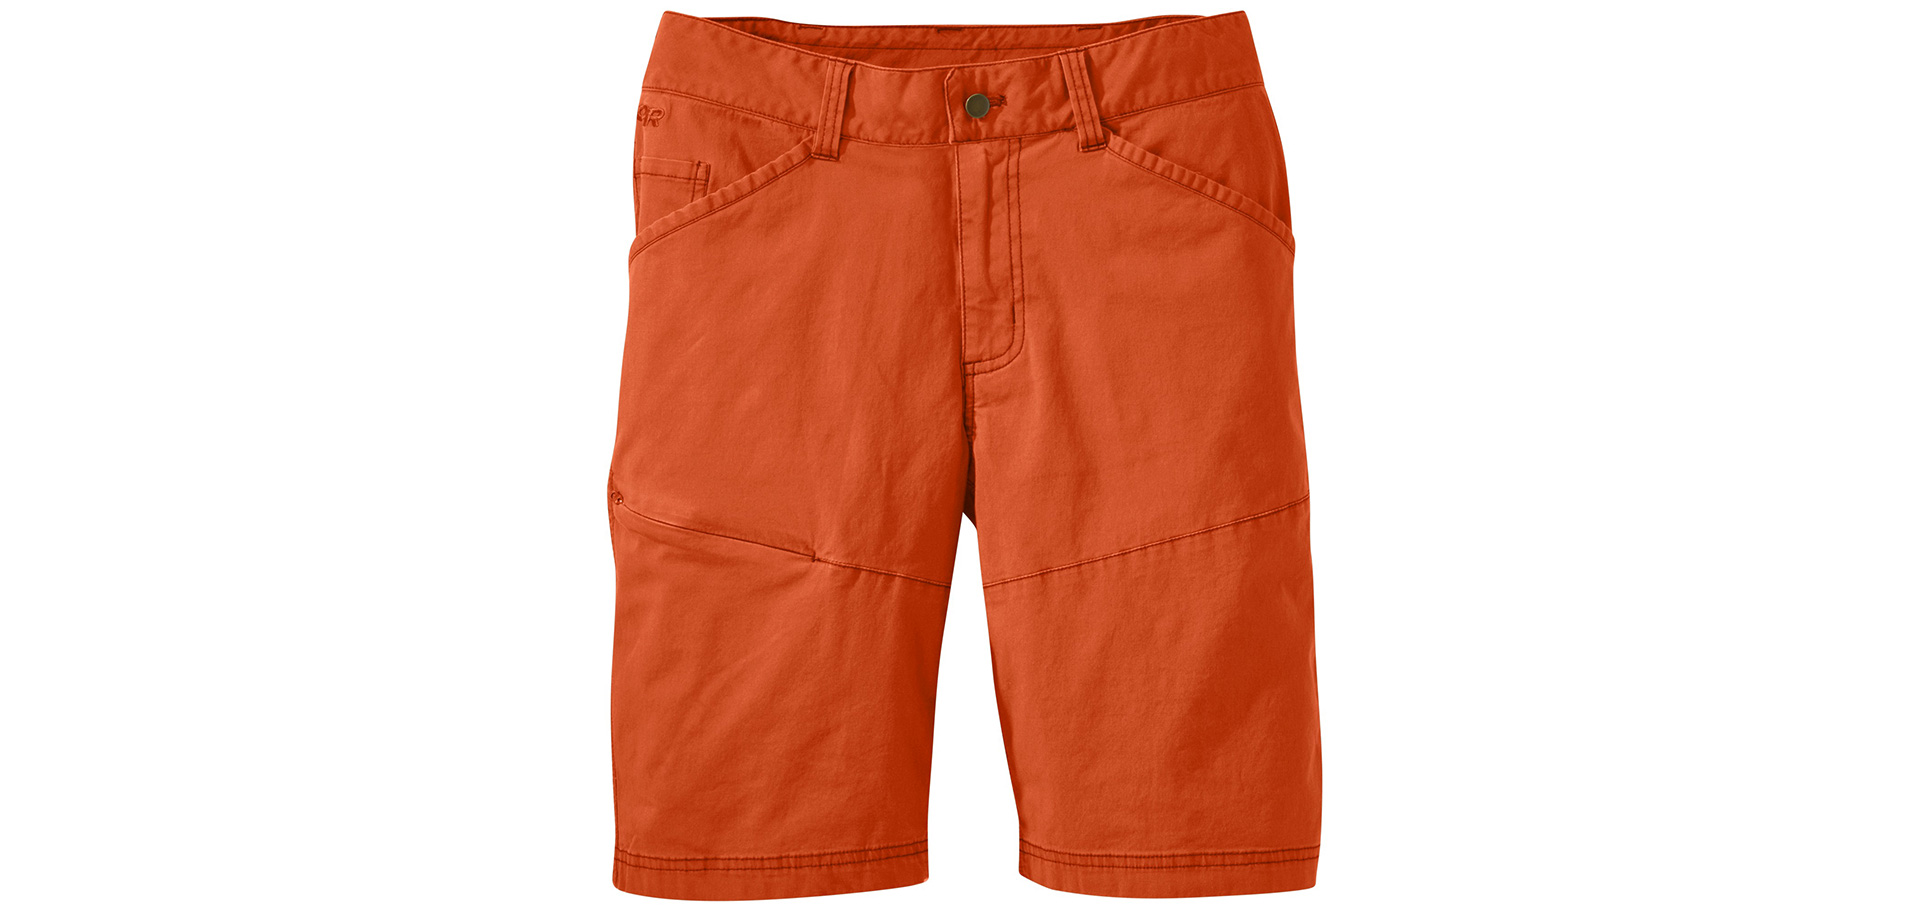 43c23d7b7d713d Outdoor Research Men s Wadi Rum Shorts